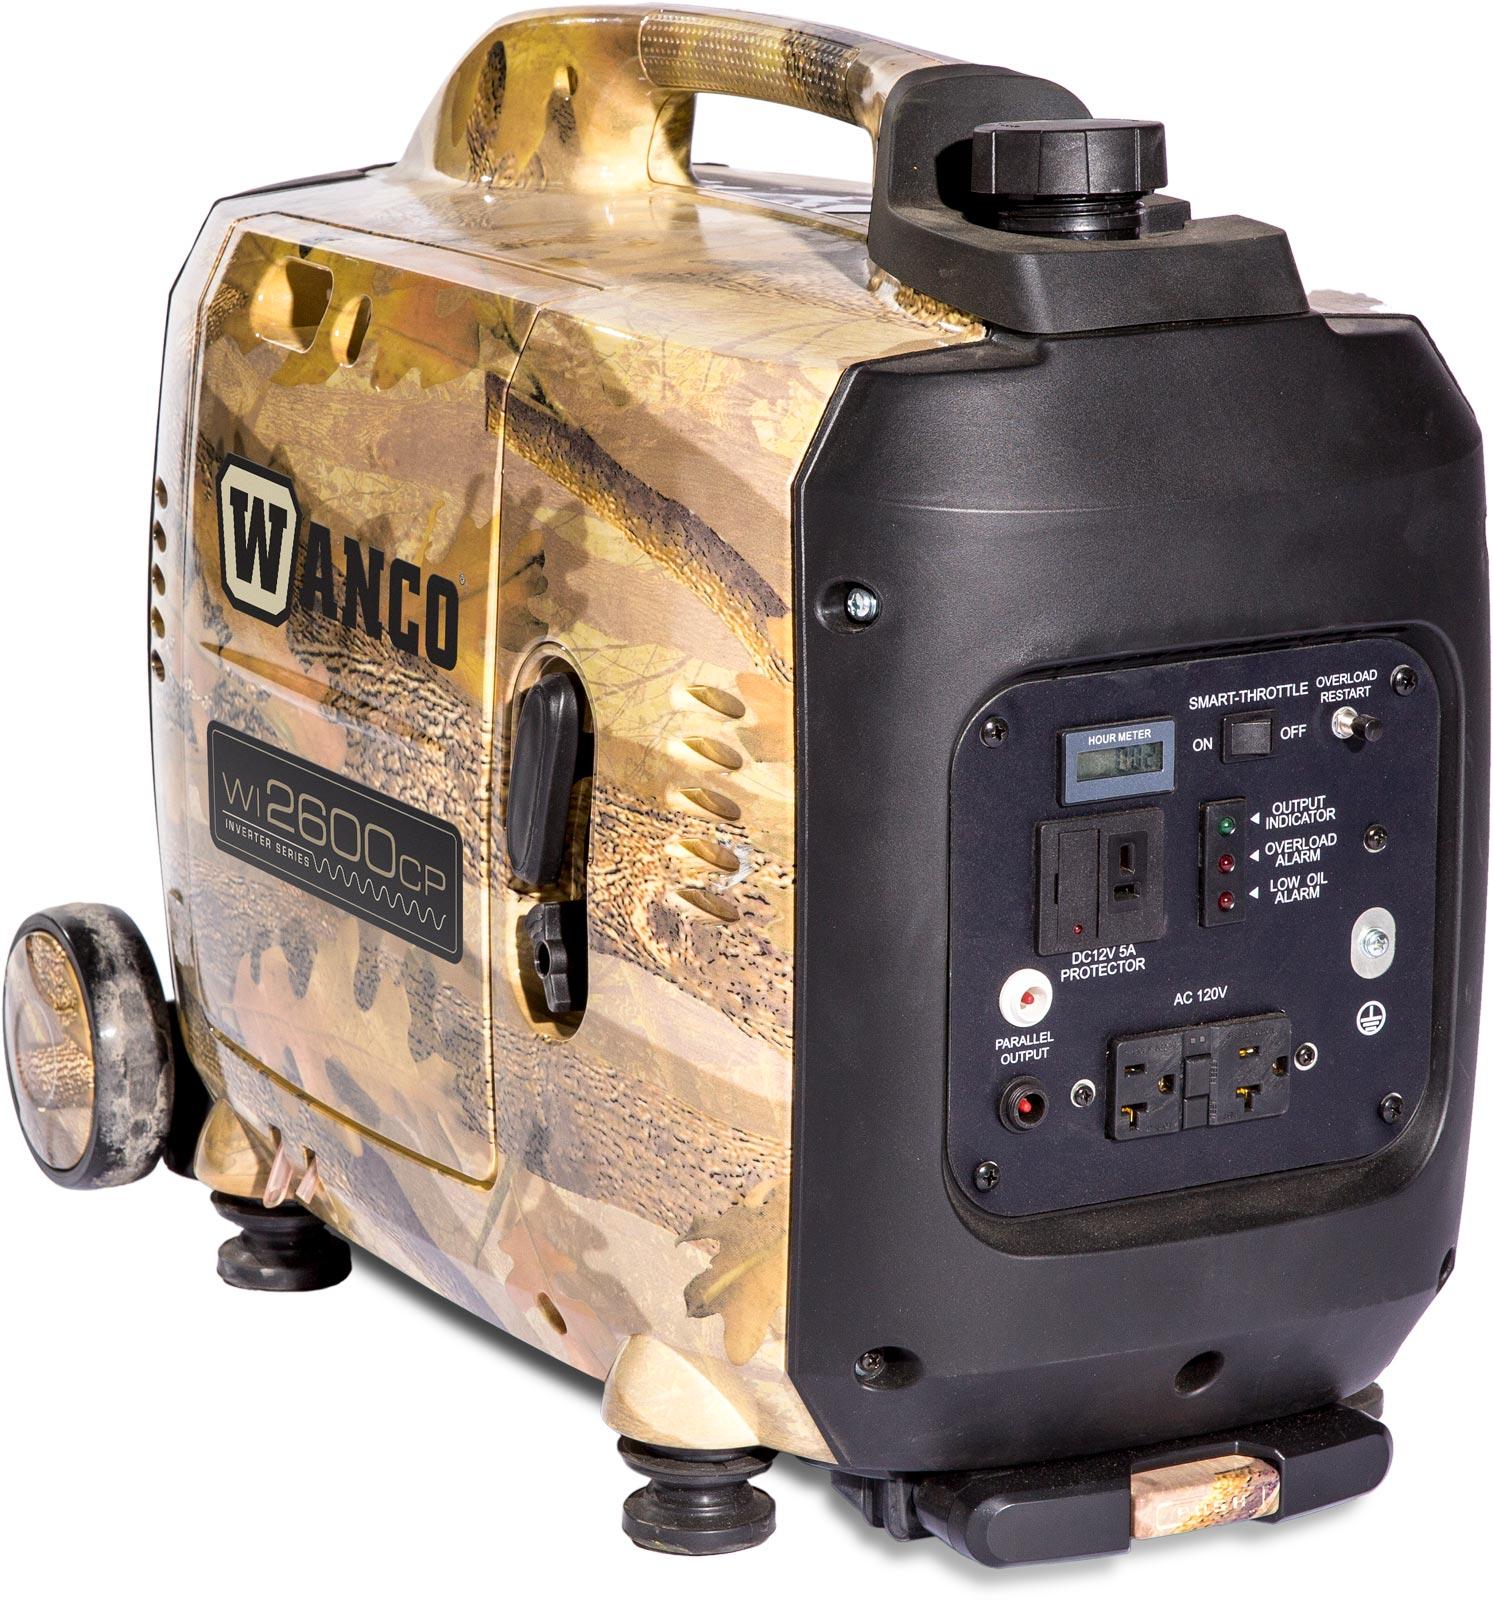 Wanco Inverter Generator - WI2600CP | Absolute Generators